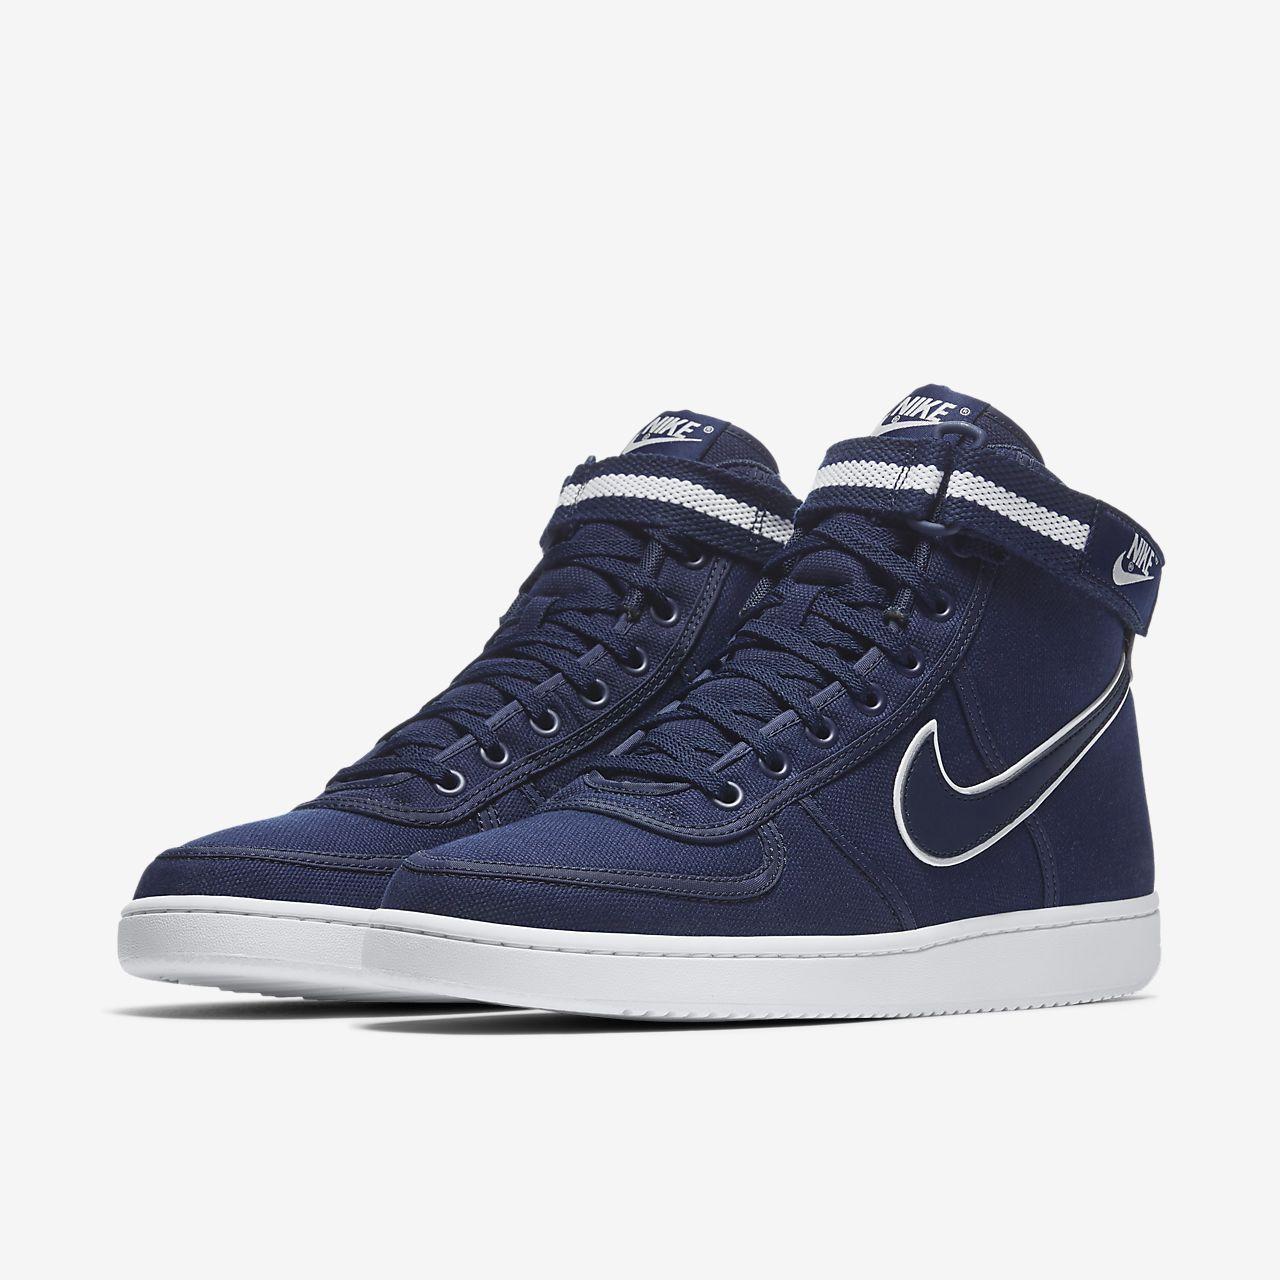 Nike Vandal High Supreme Men's Lifestyle Shoes Blue/White fZ8569S